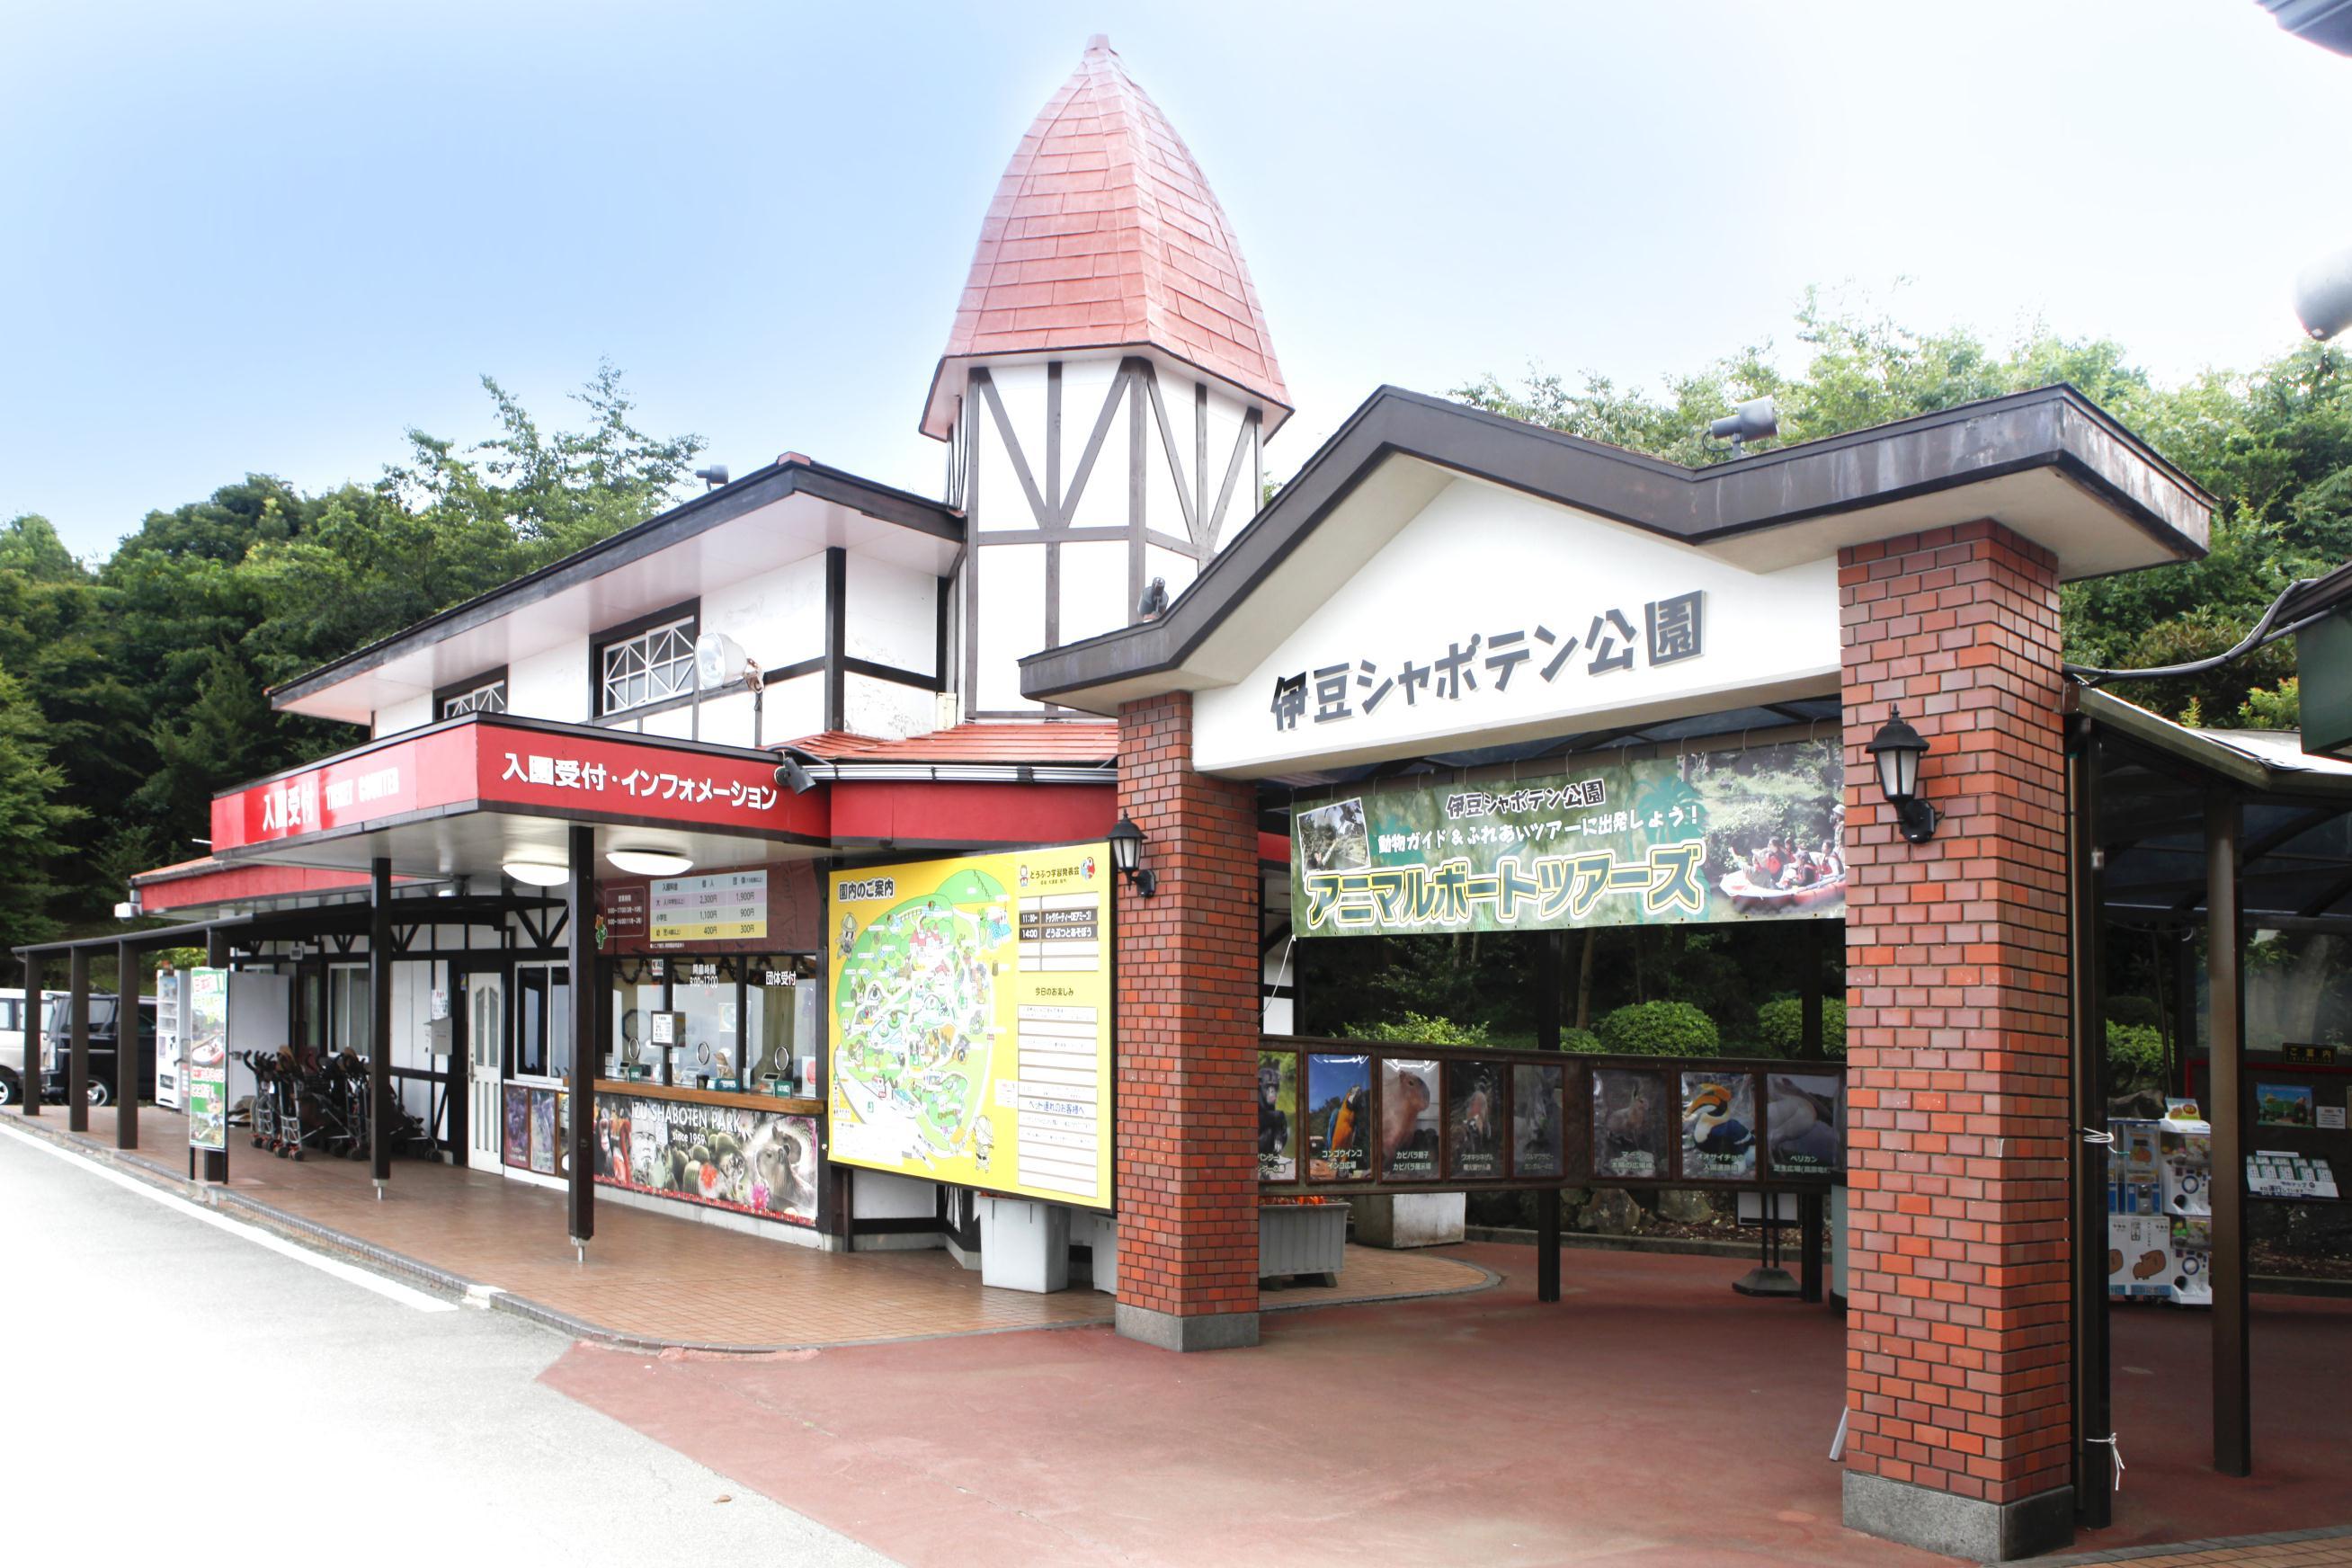 Izu Shaboten Zoo Ticket